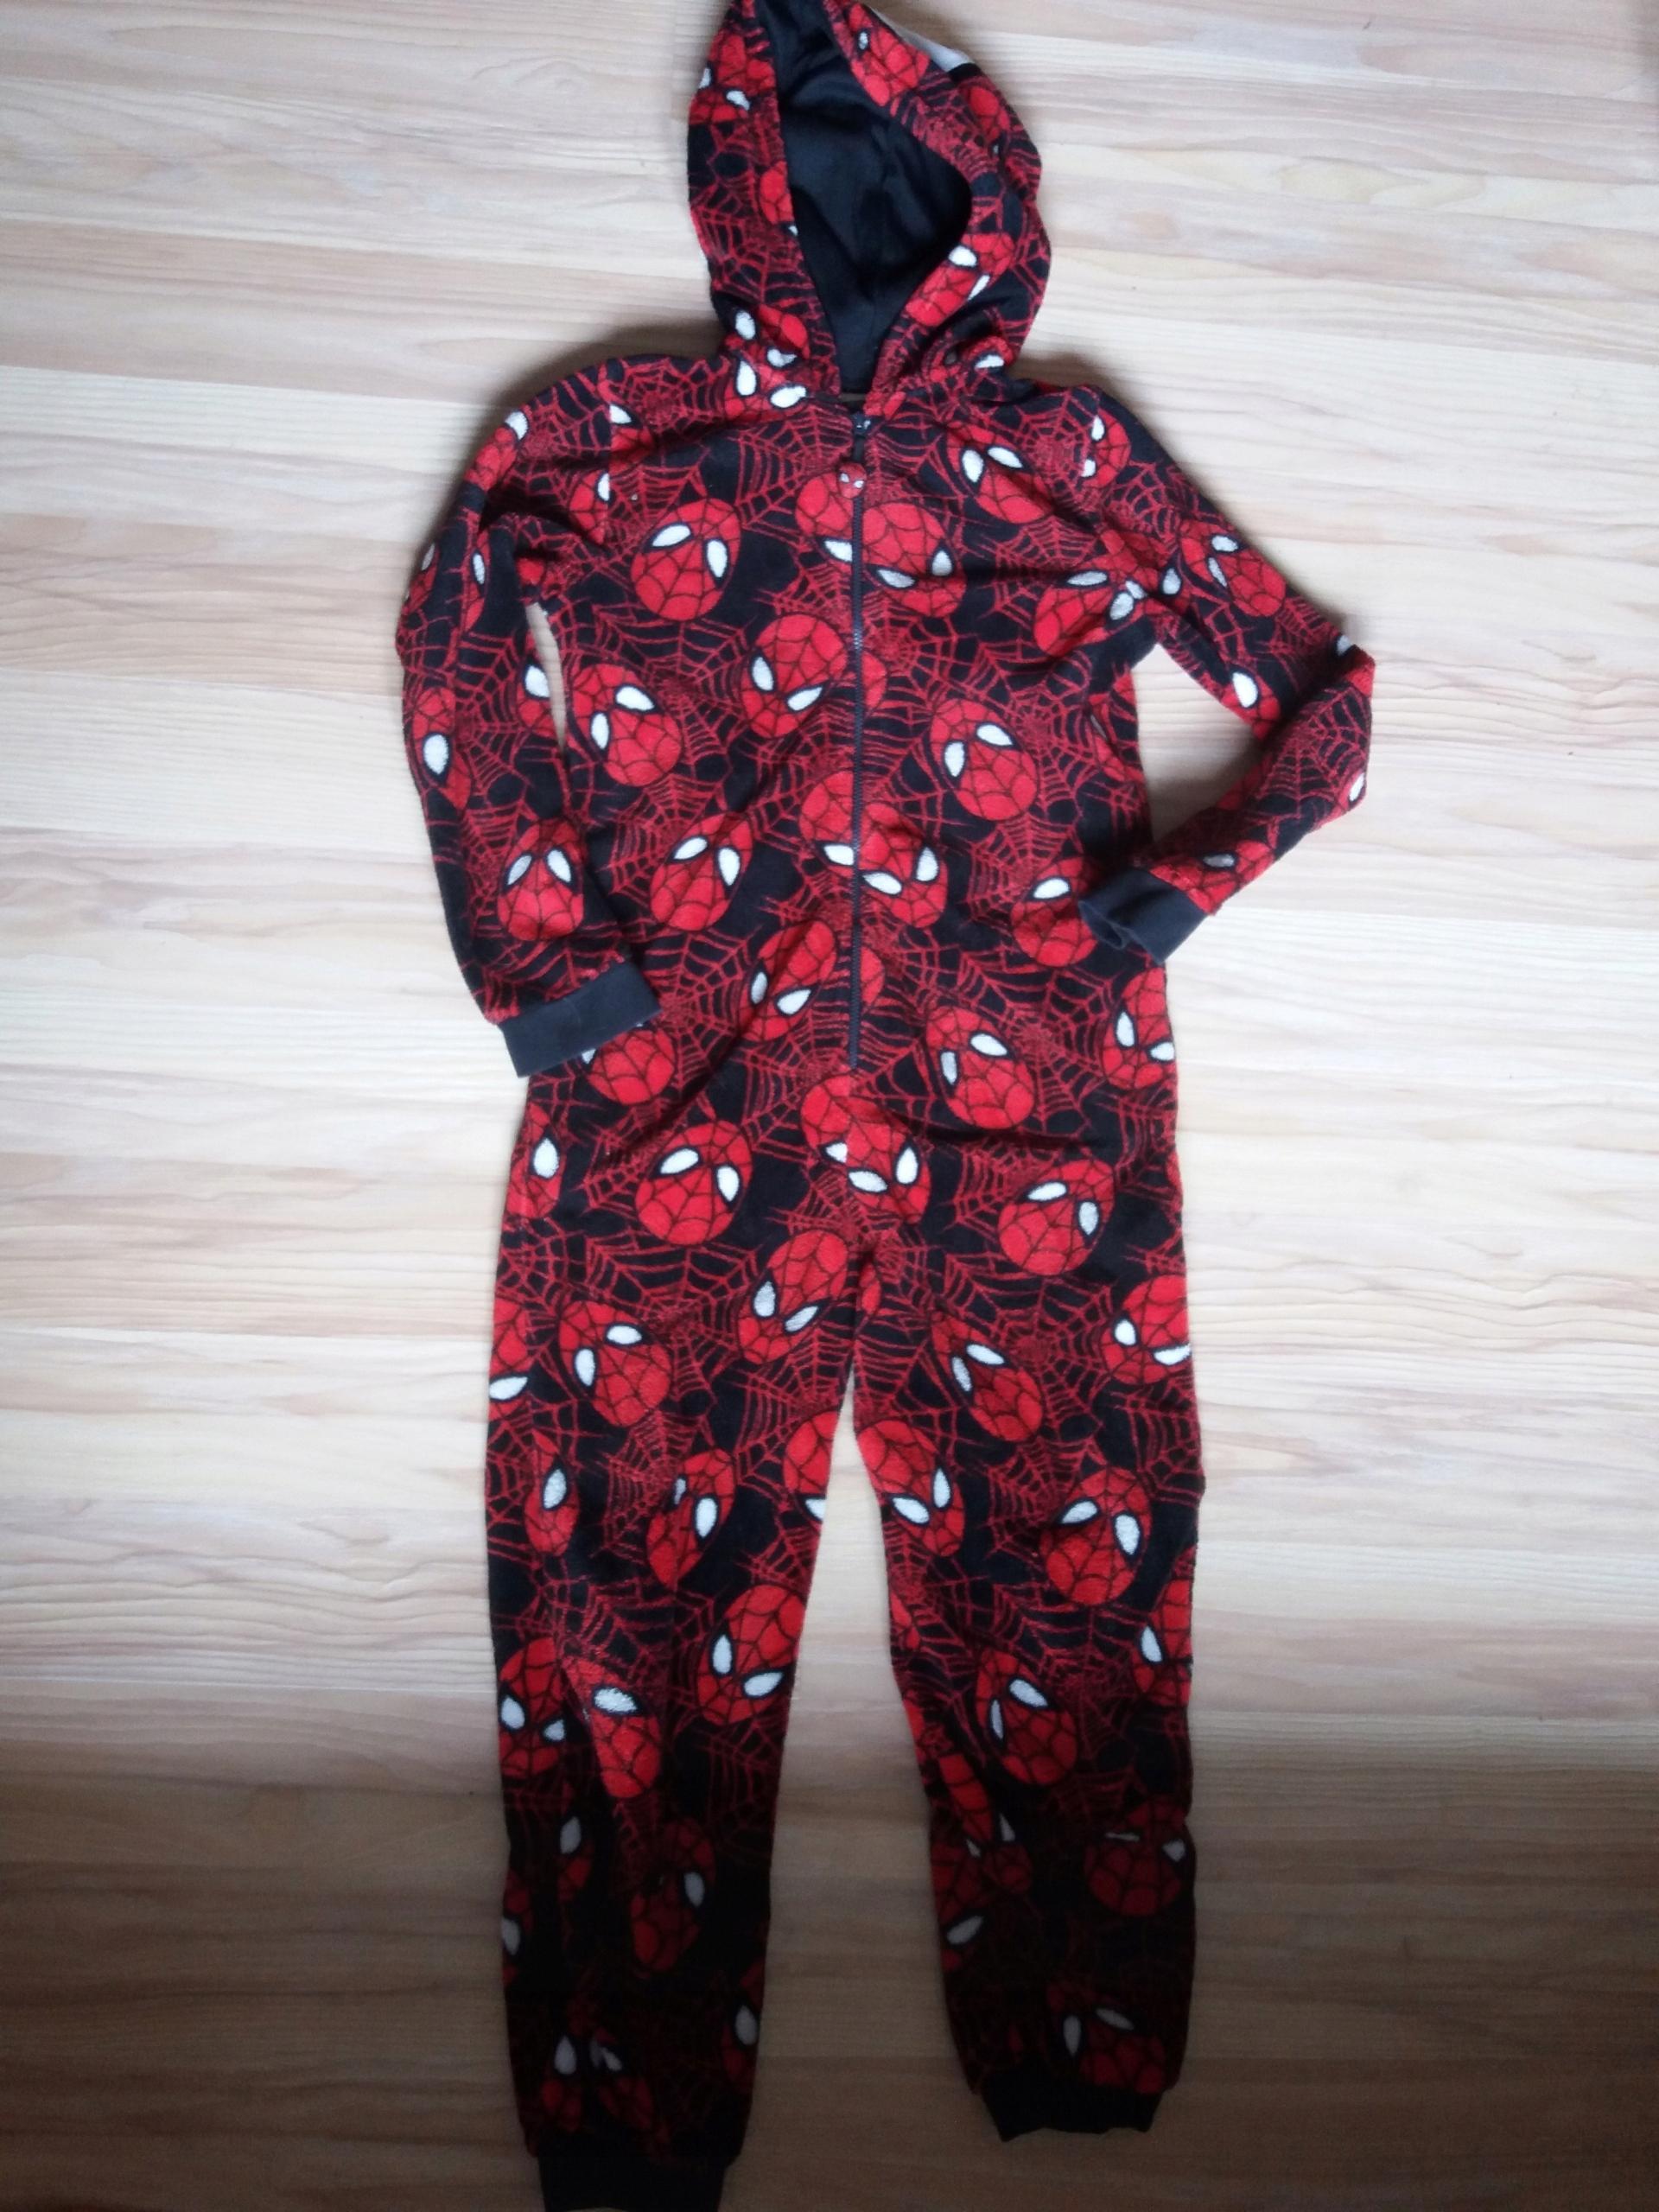 7147d2521bac7b MARVIEL, SPIDERMAN piżama pajacyk kostium r.140 - 7526715558 ...